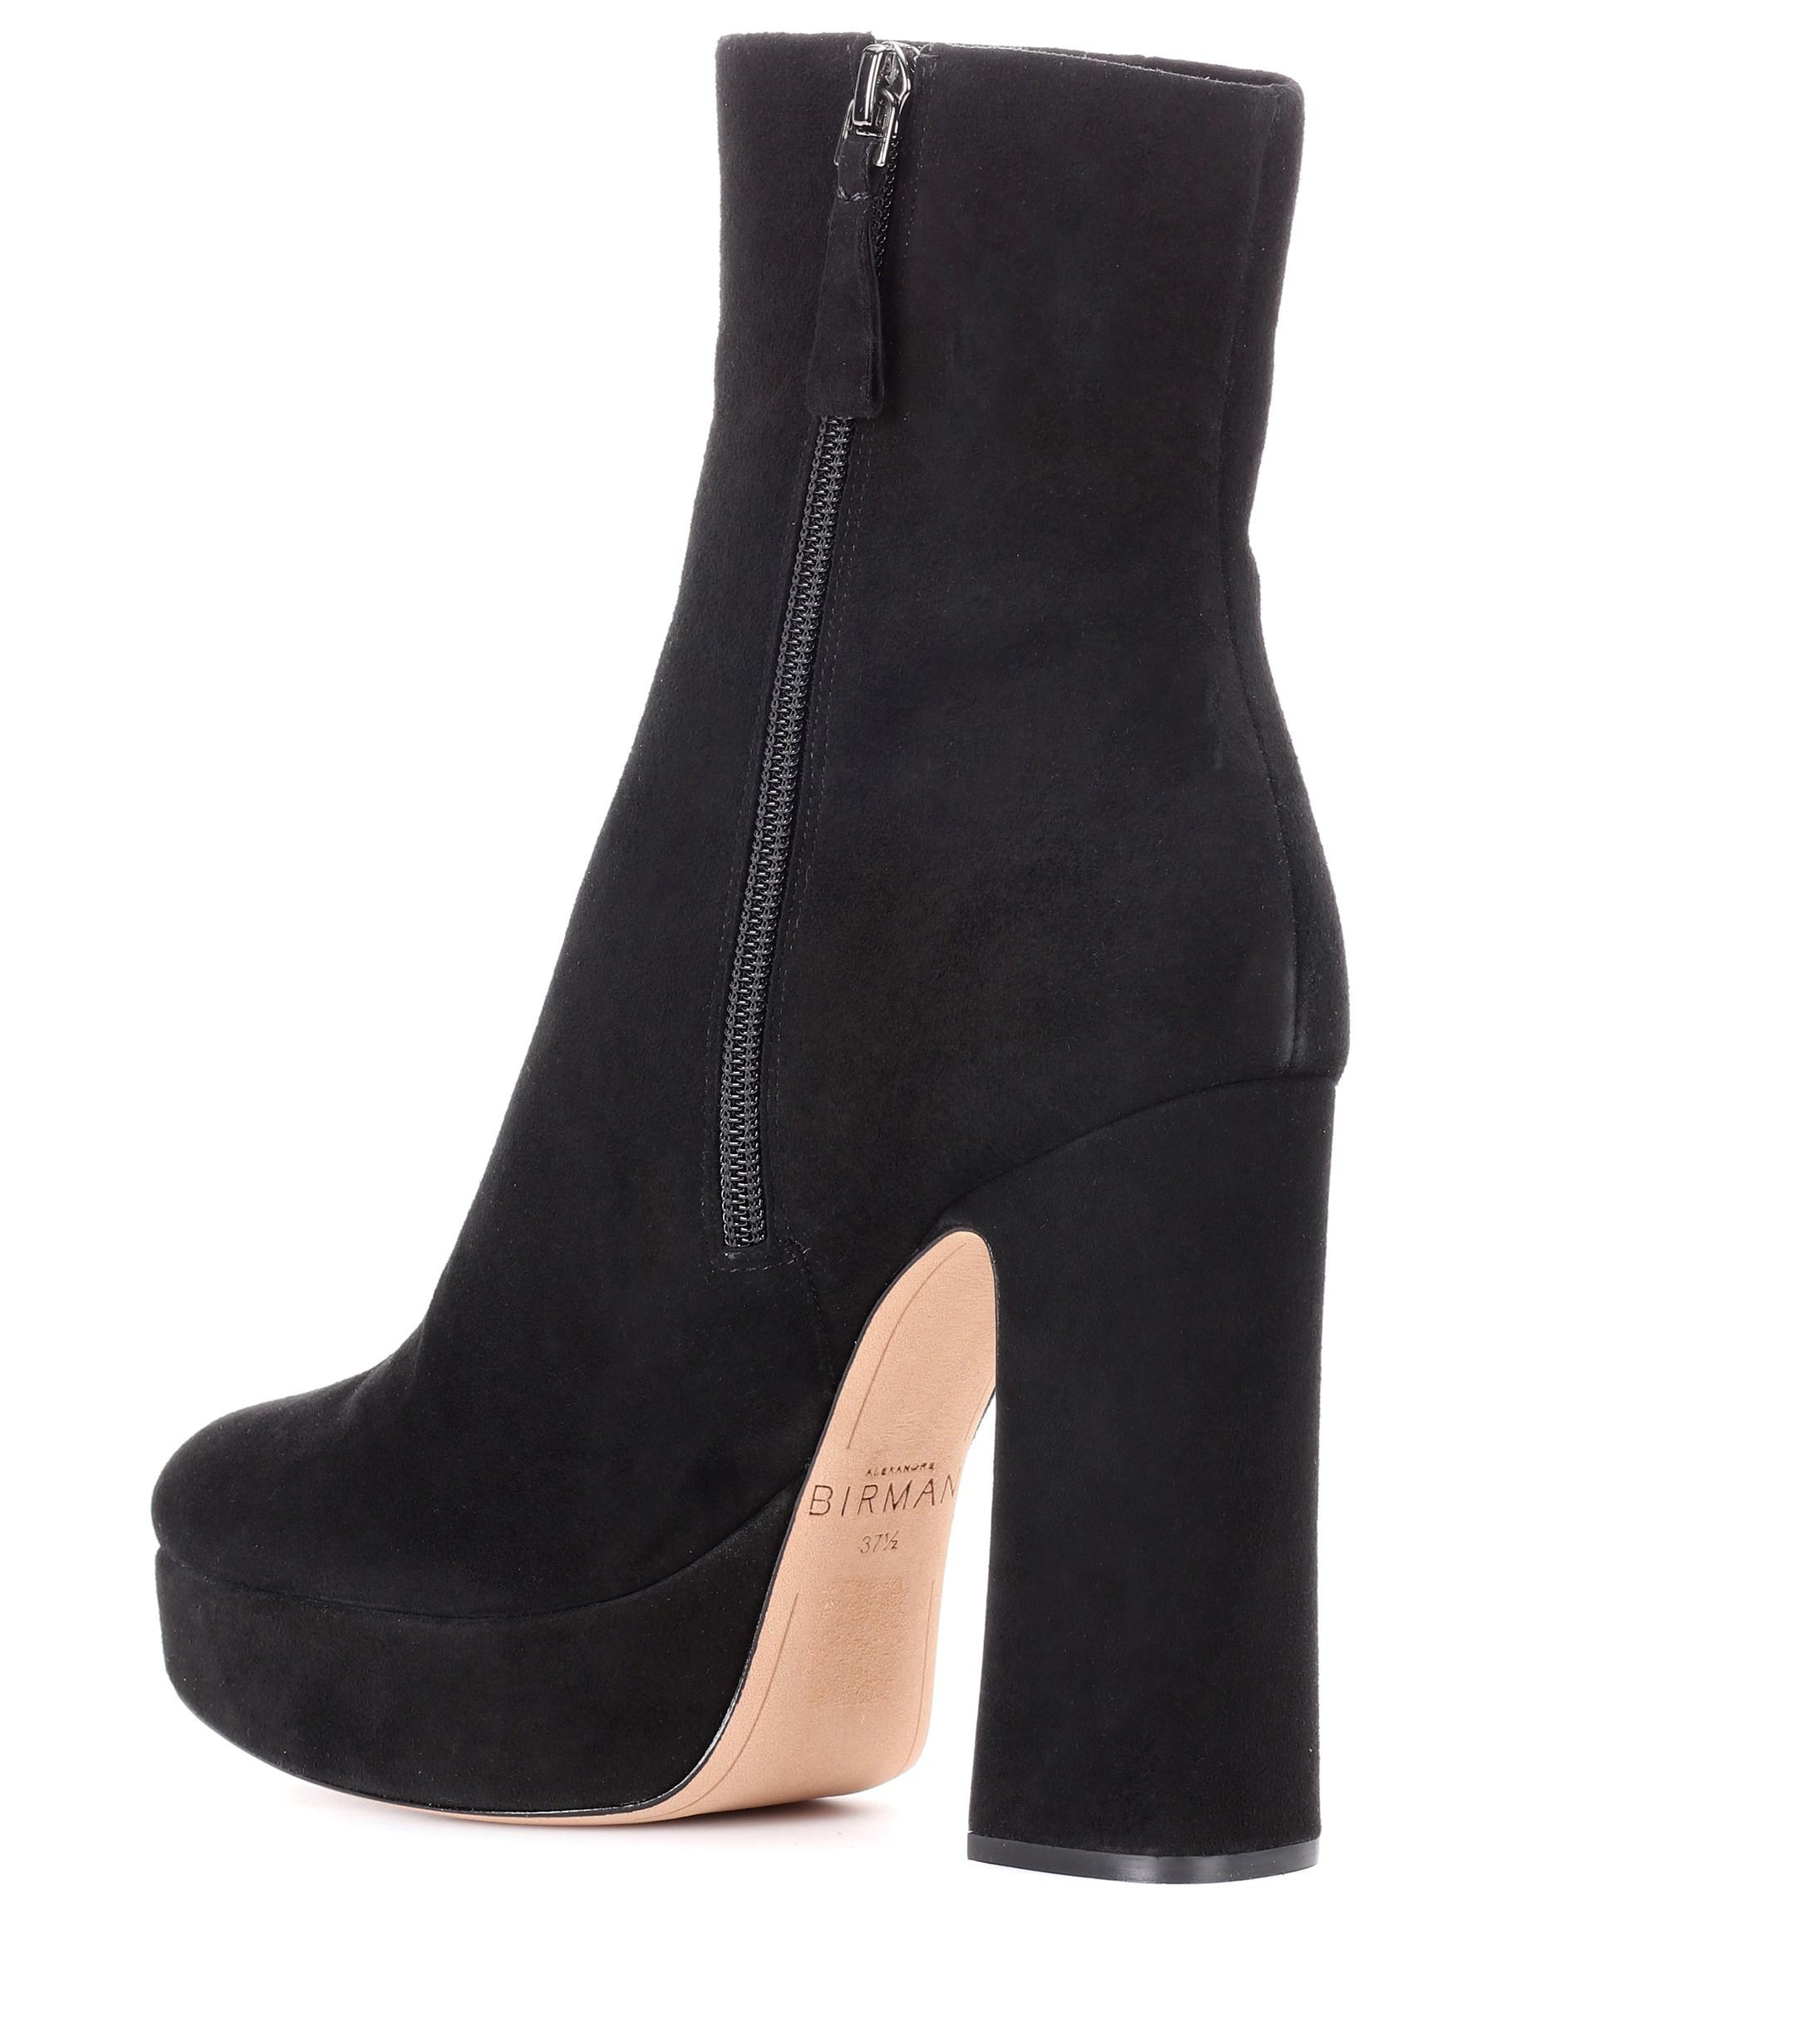 Alexandre Birman Suede Plateau Ankle Boots in Black